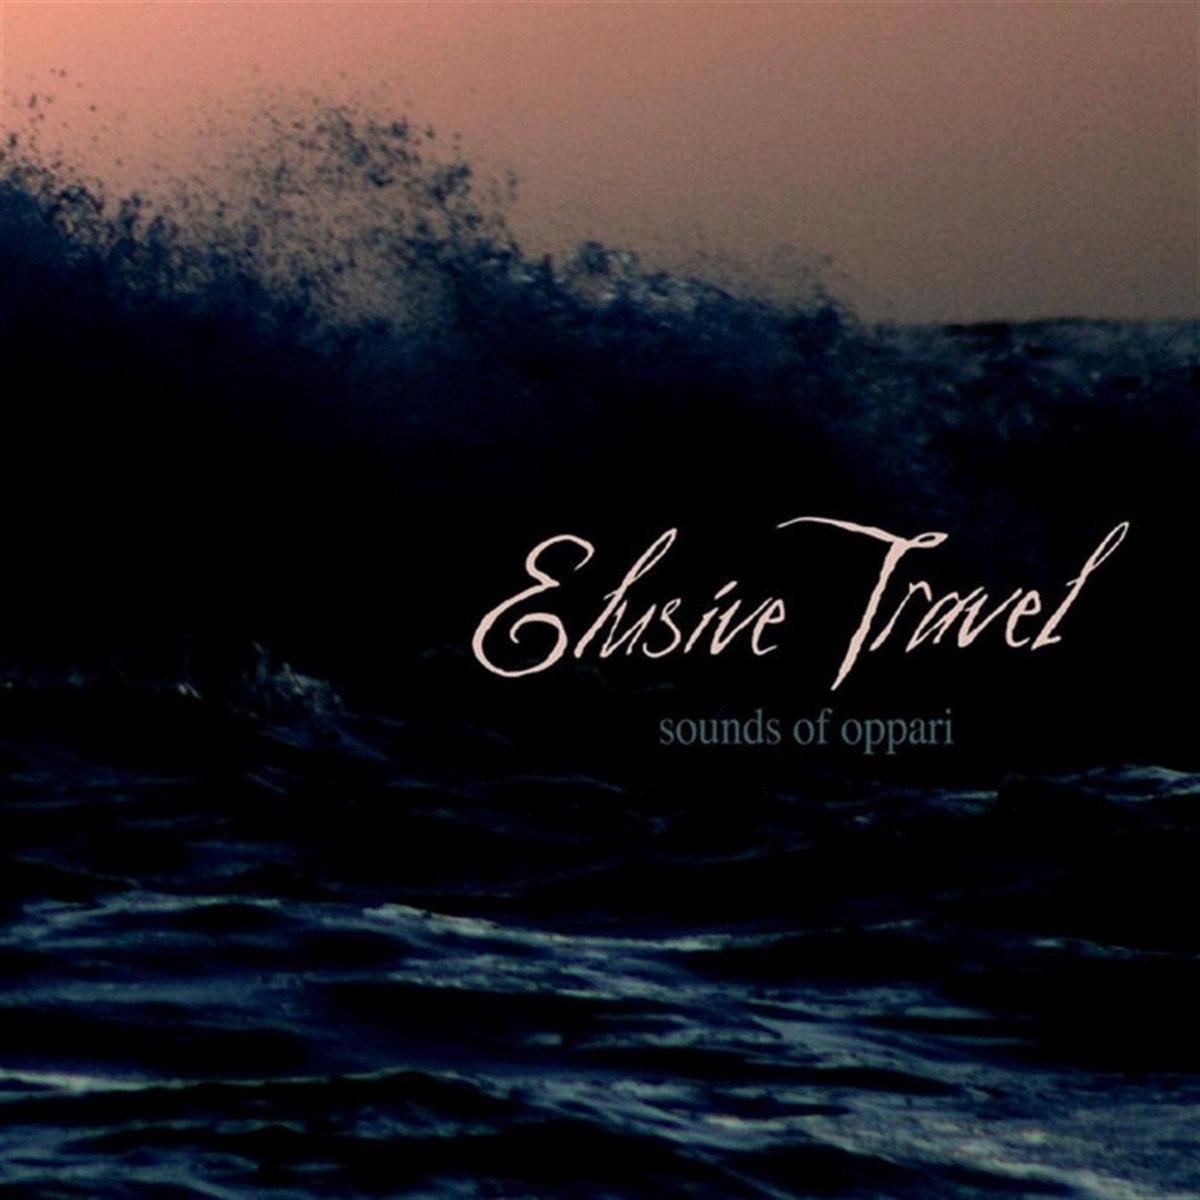 Elusive Travel - Sounds of Oppari